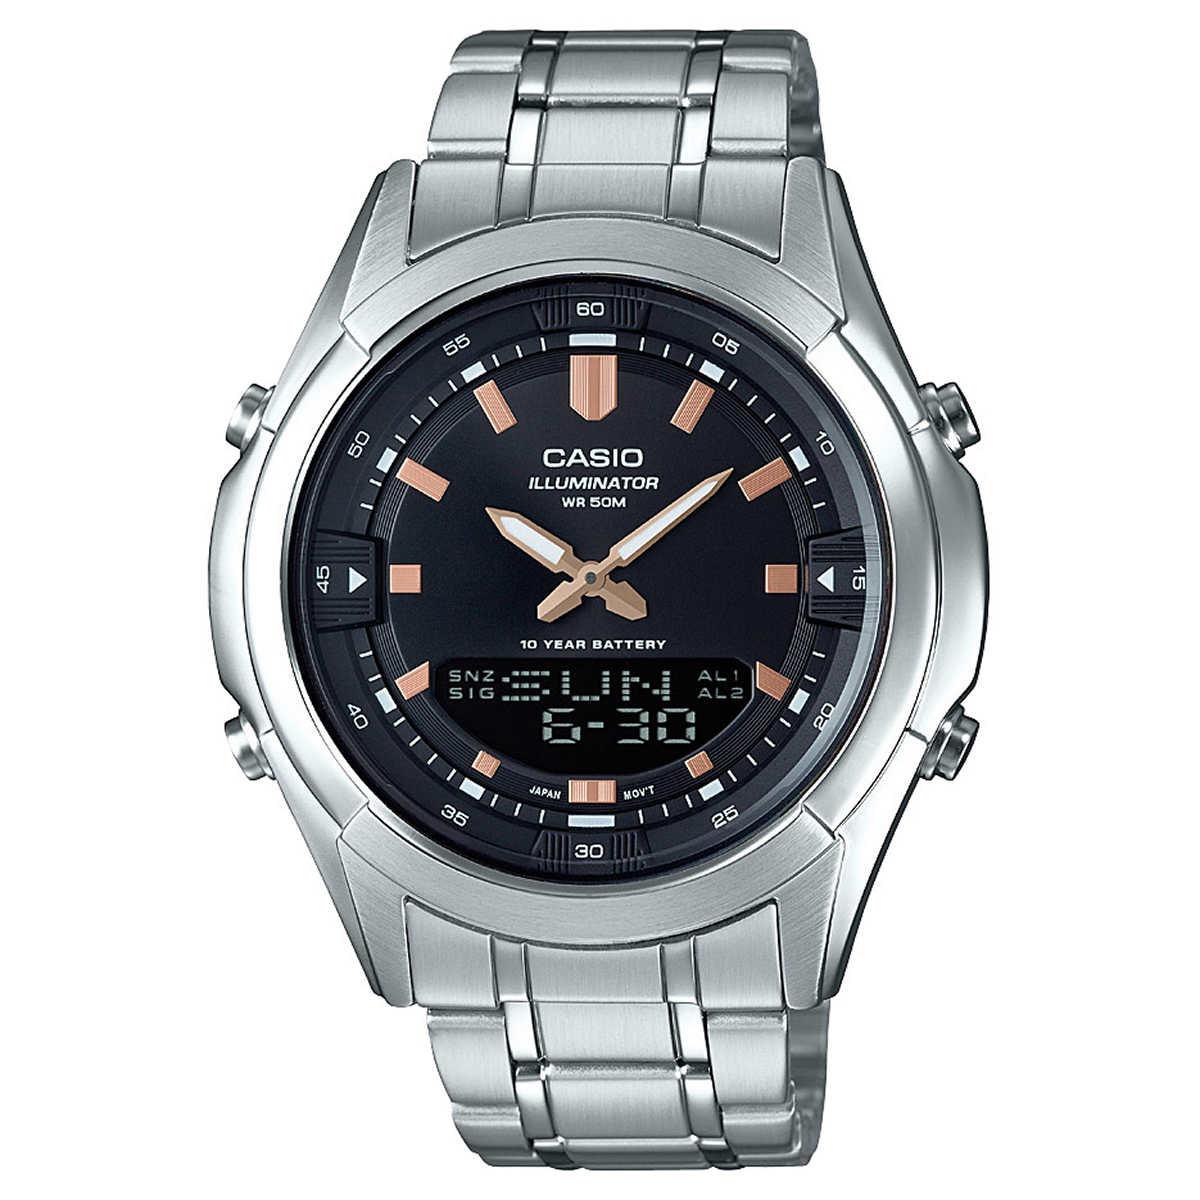 a0e594c33 ... Casio Analog and Digital Men's Watch. 1 1